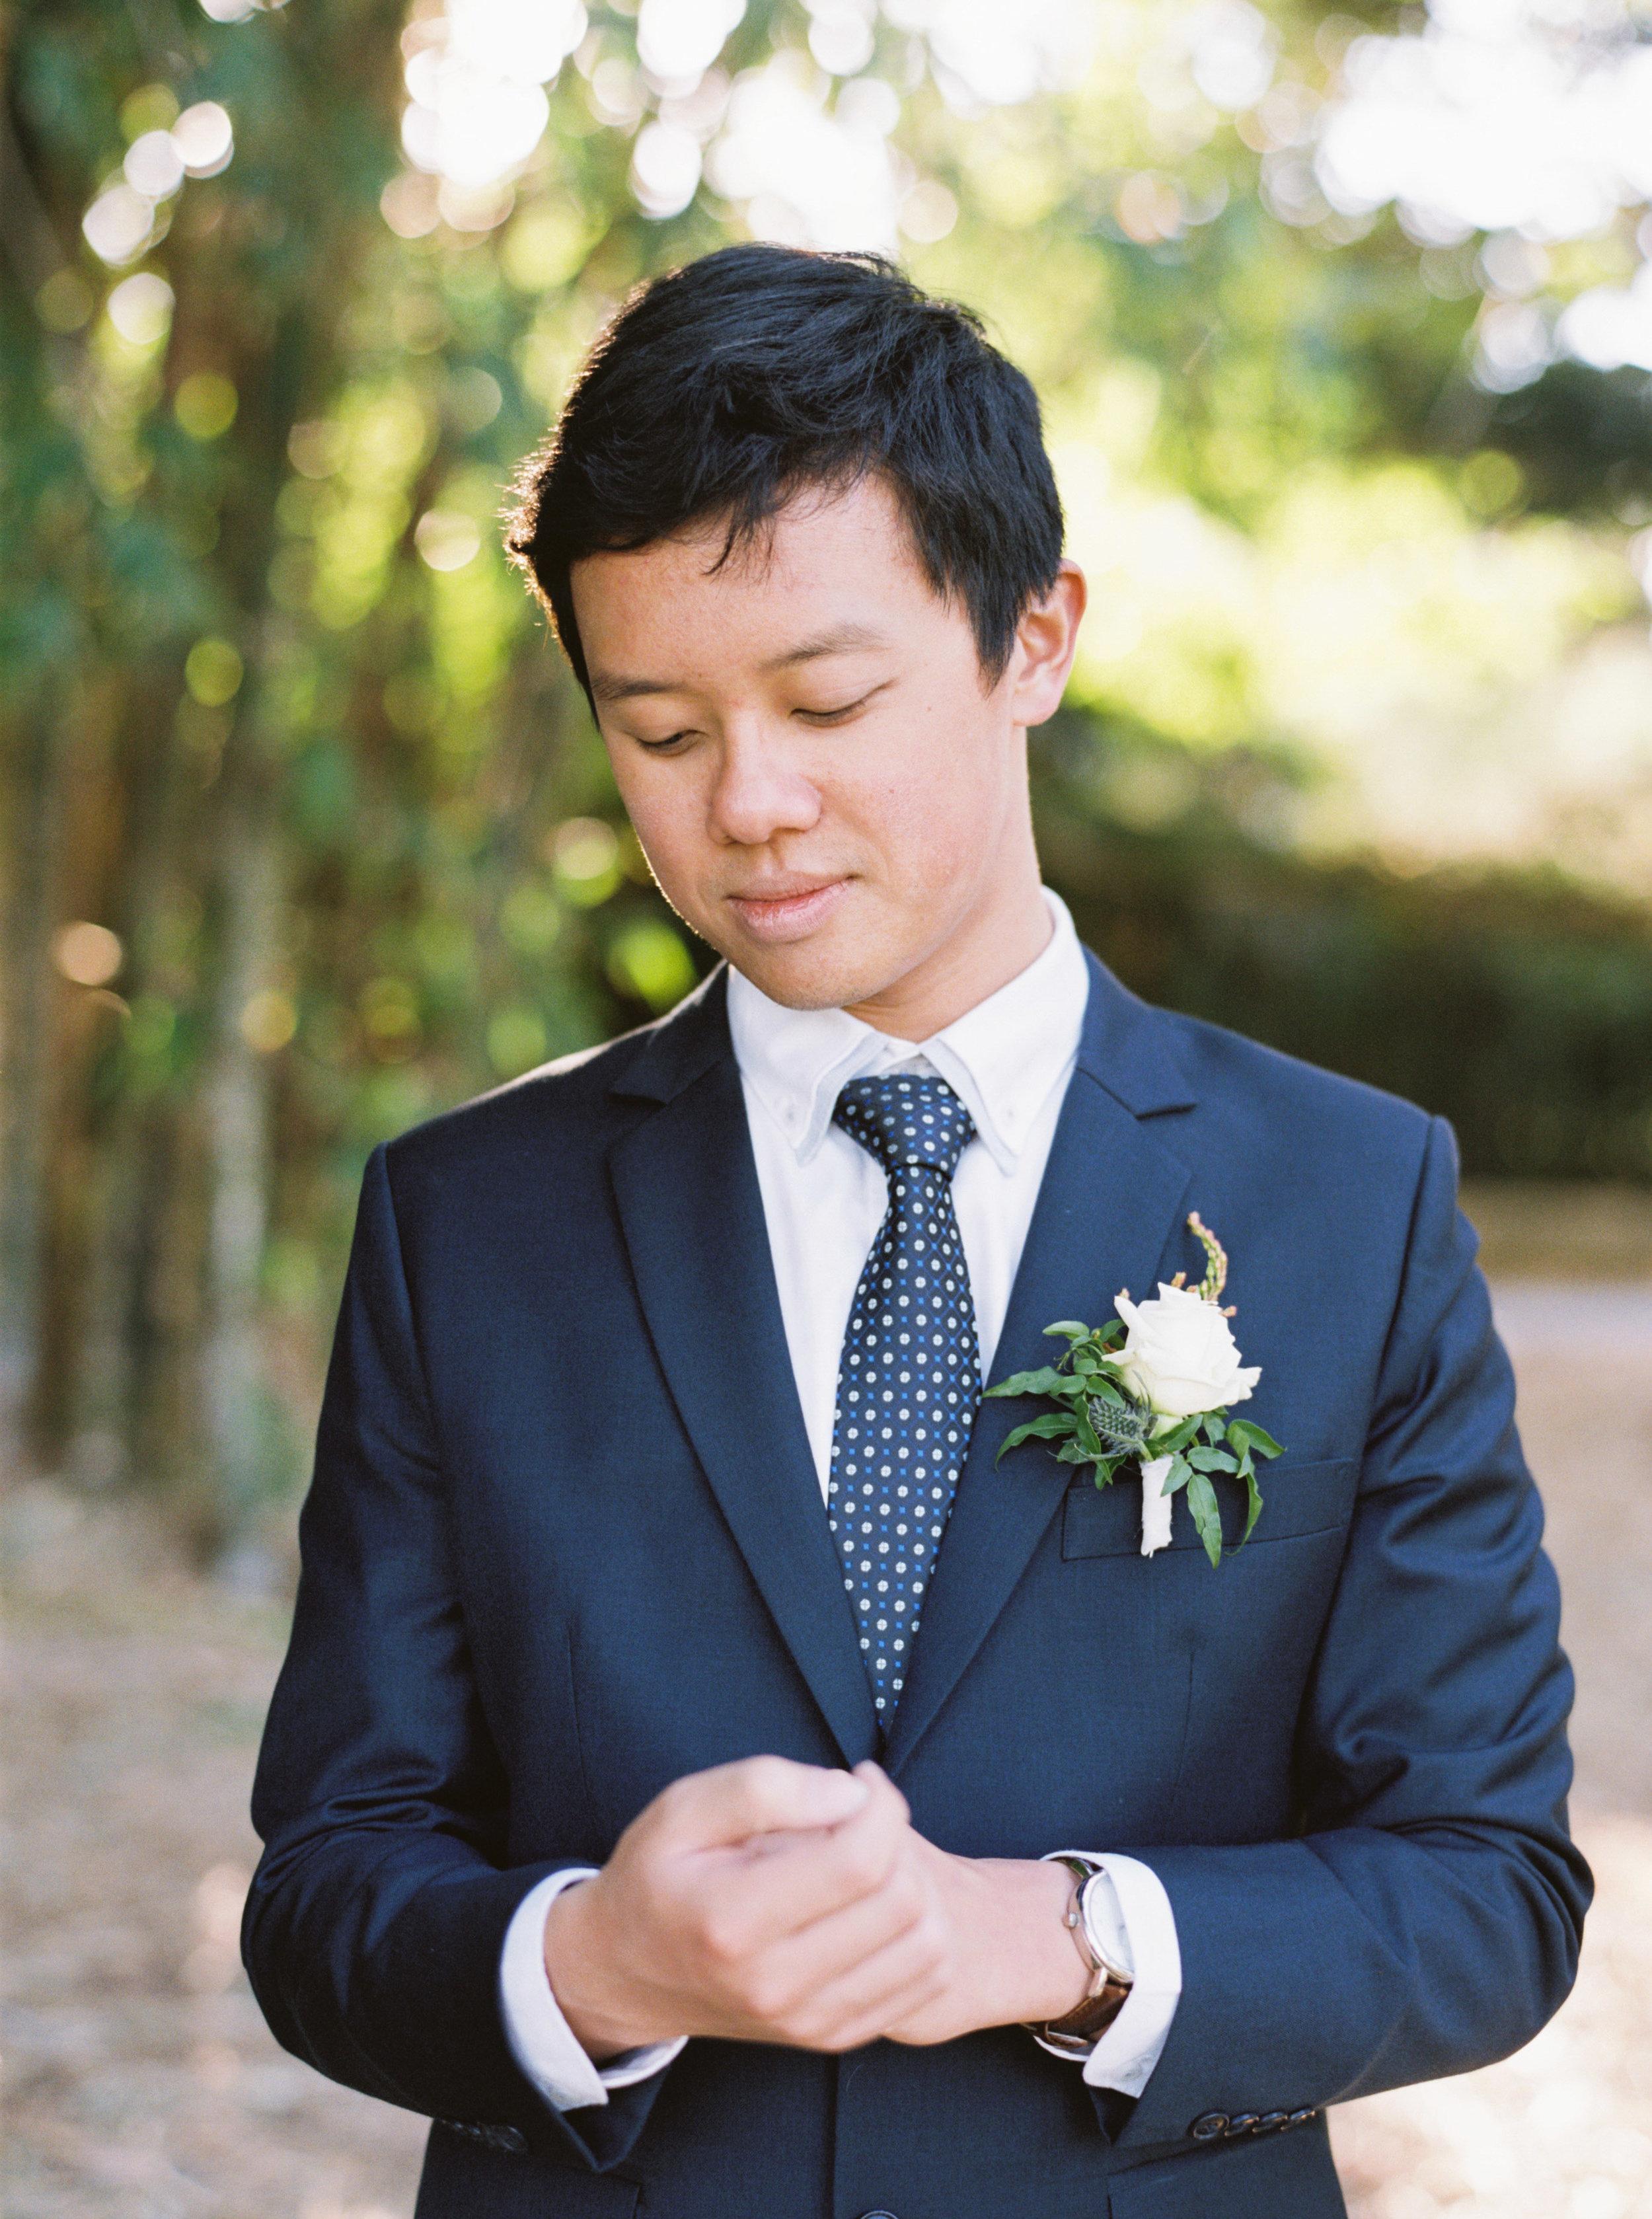 00030- Australia Sydney Wedding Photographer Sheri McMahon.jpg